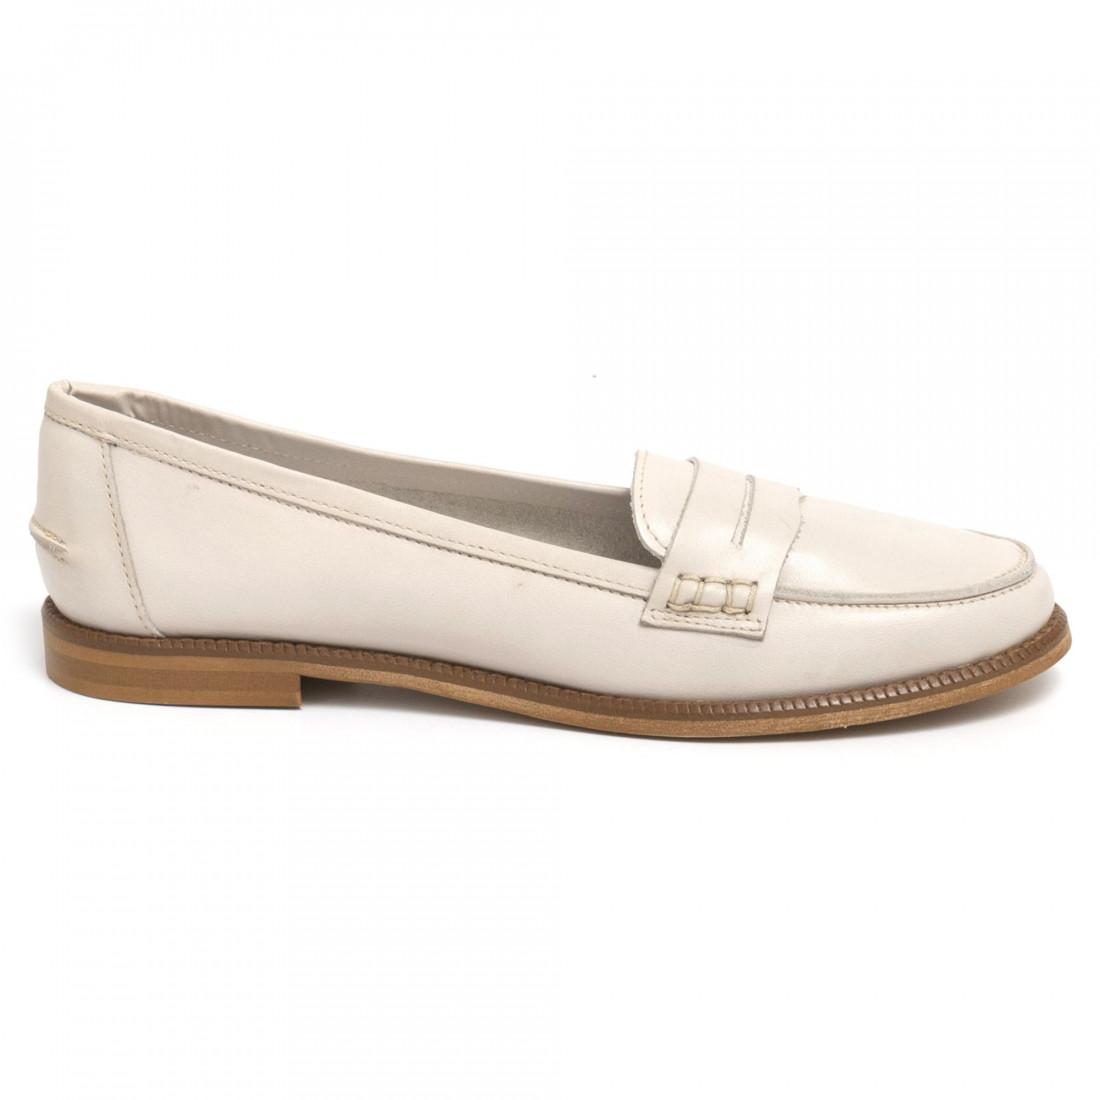 loafers woman sangiorgio 7340madrid marmo 7258